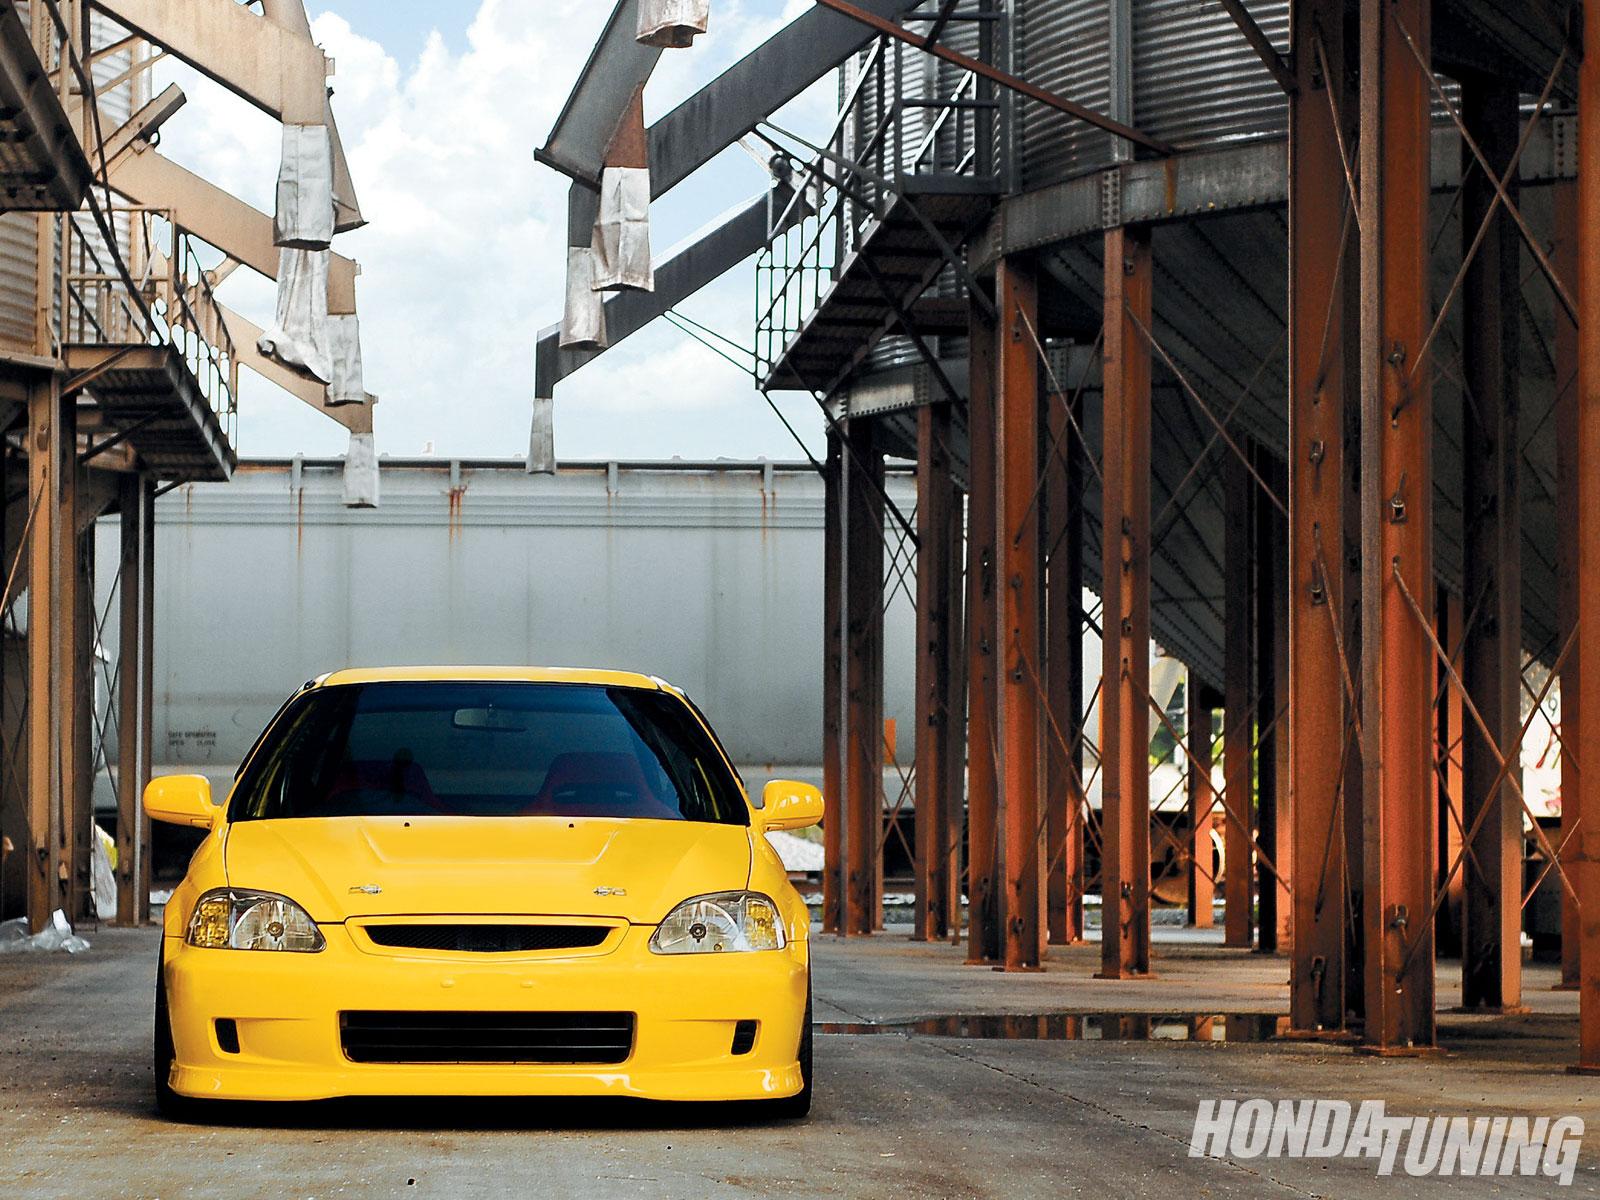 Kelebihan Kekurangan Honda Civic Type R 2000 Murah Berkualitas